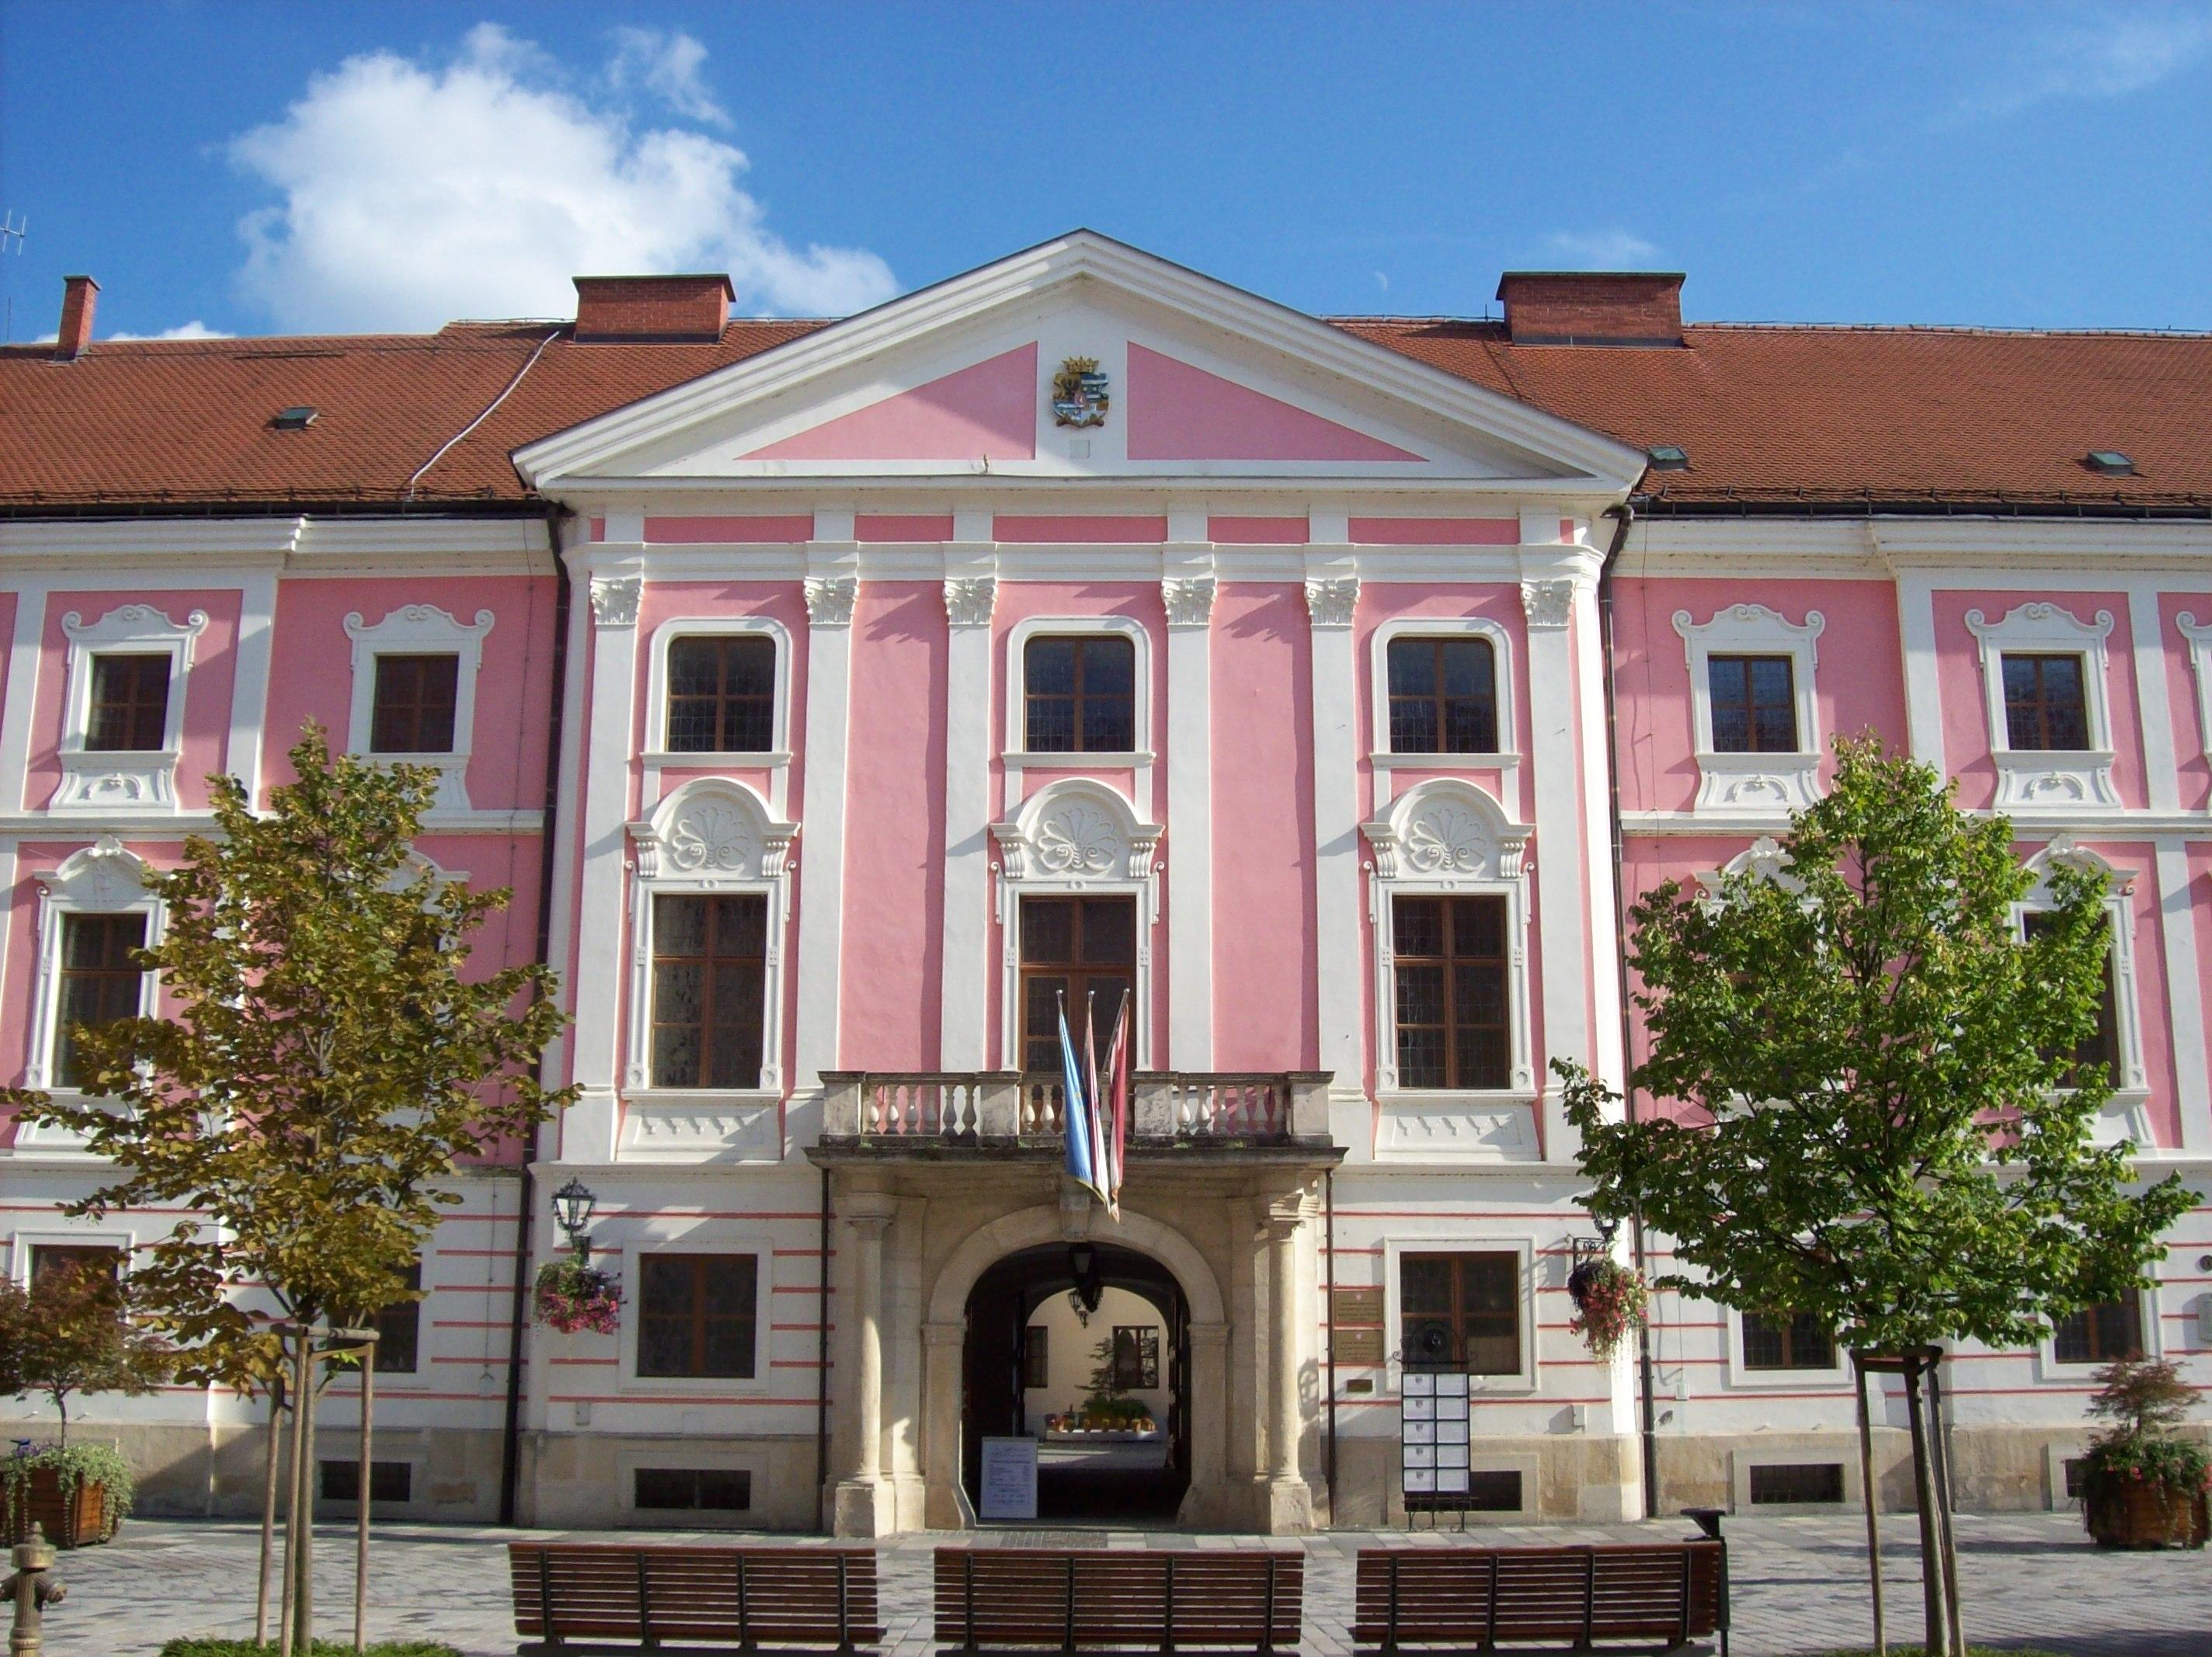 Regione di Varaždin